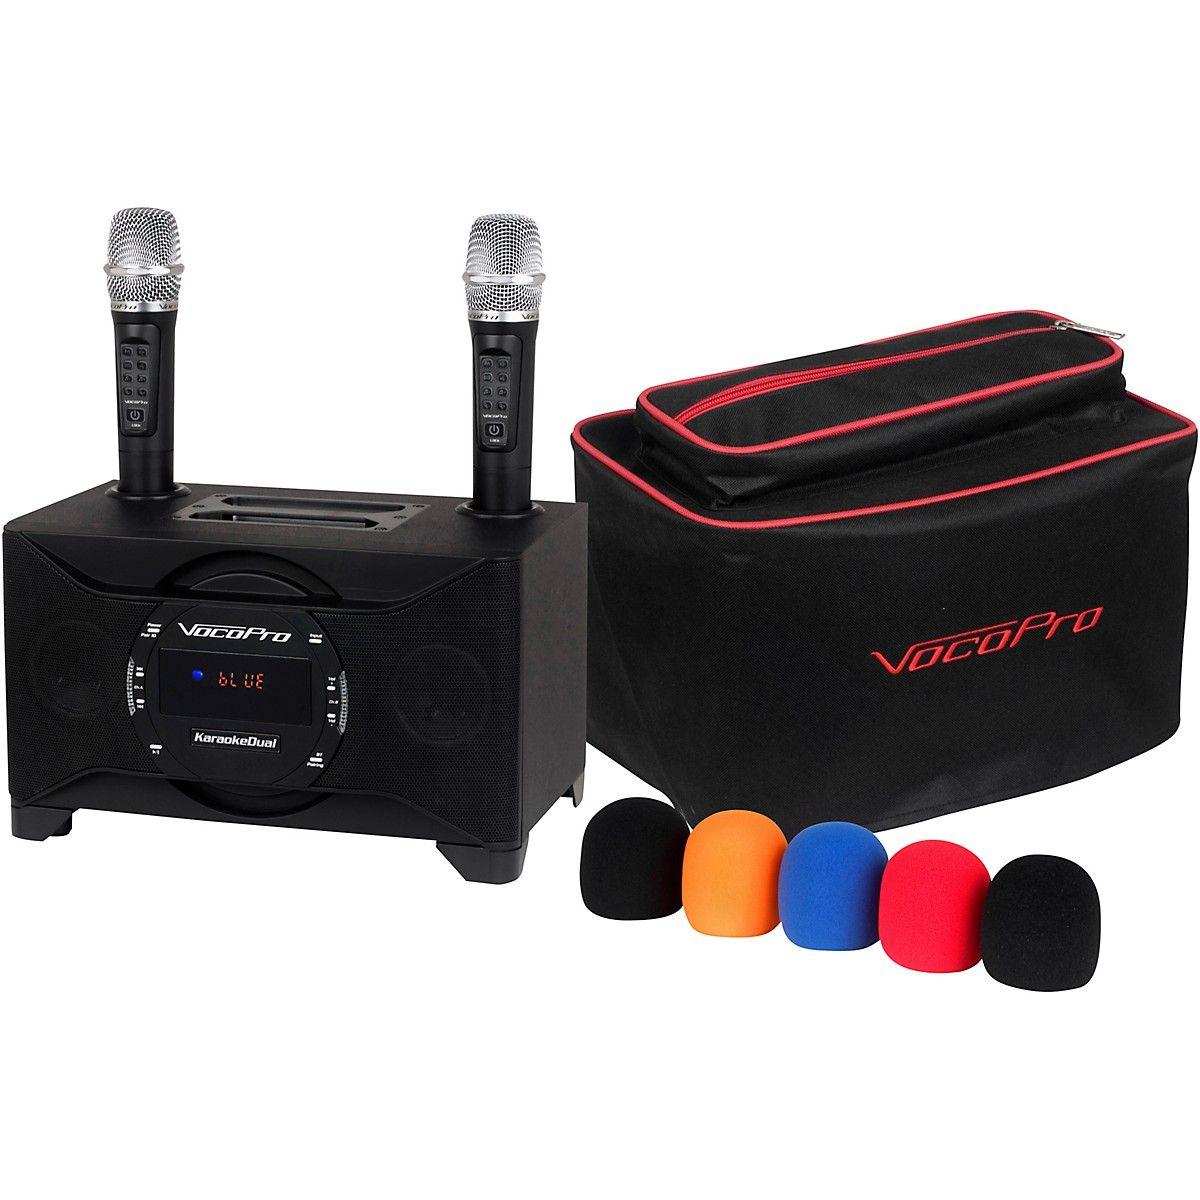 VocoProKaraokeDual-Plus Karaoke System with Wireless Microphones and Bluetooth